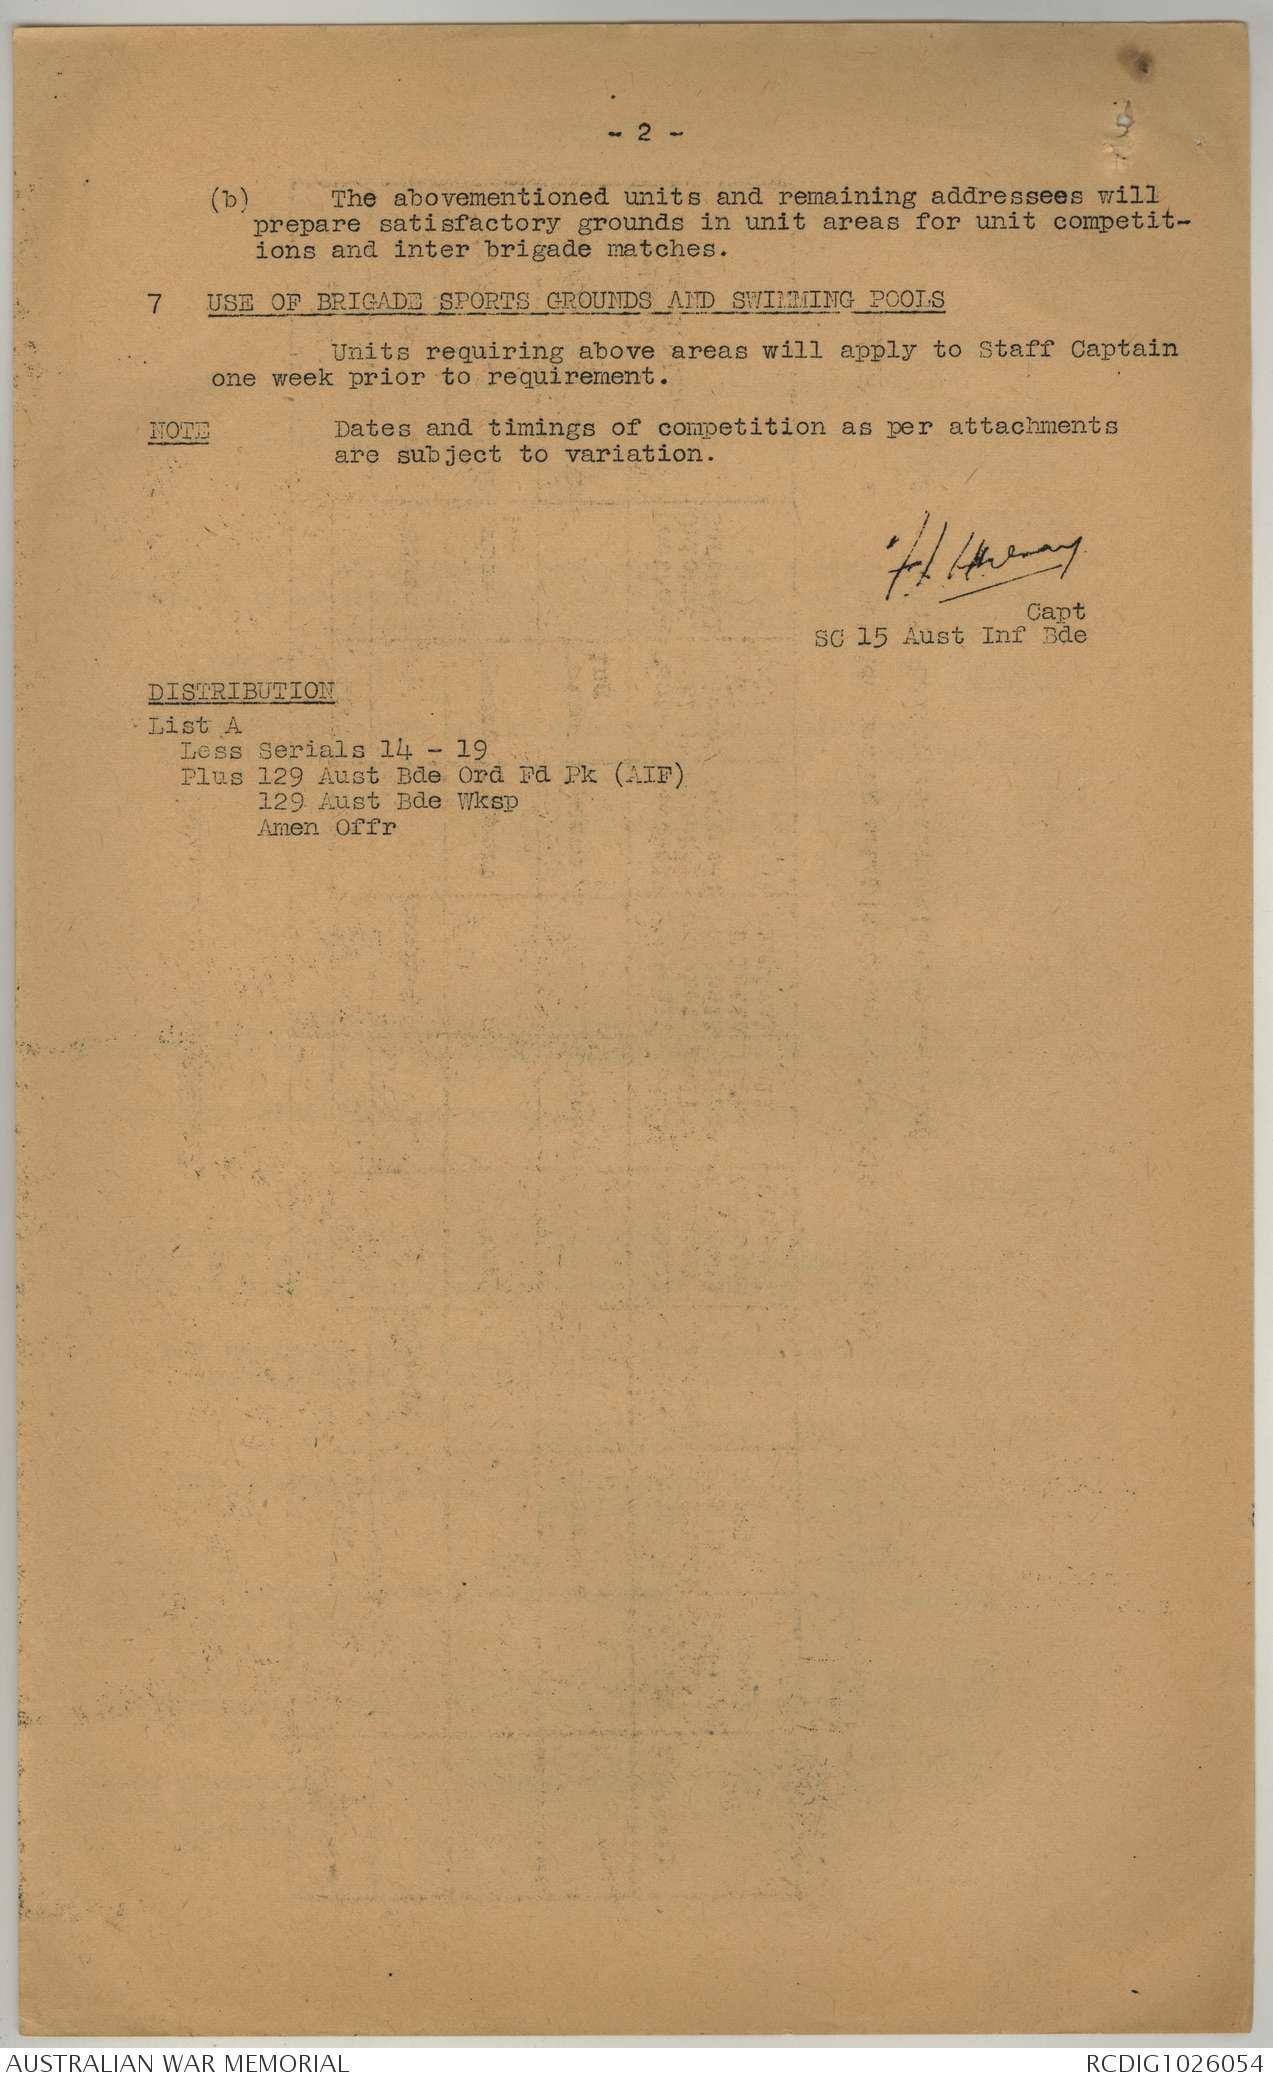 AWM52 8/2/15/88 - February 1945 | The Australian War Memorial